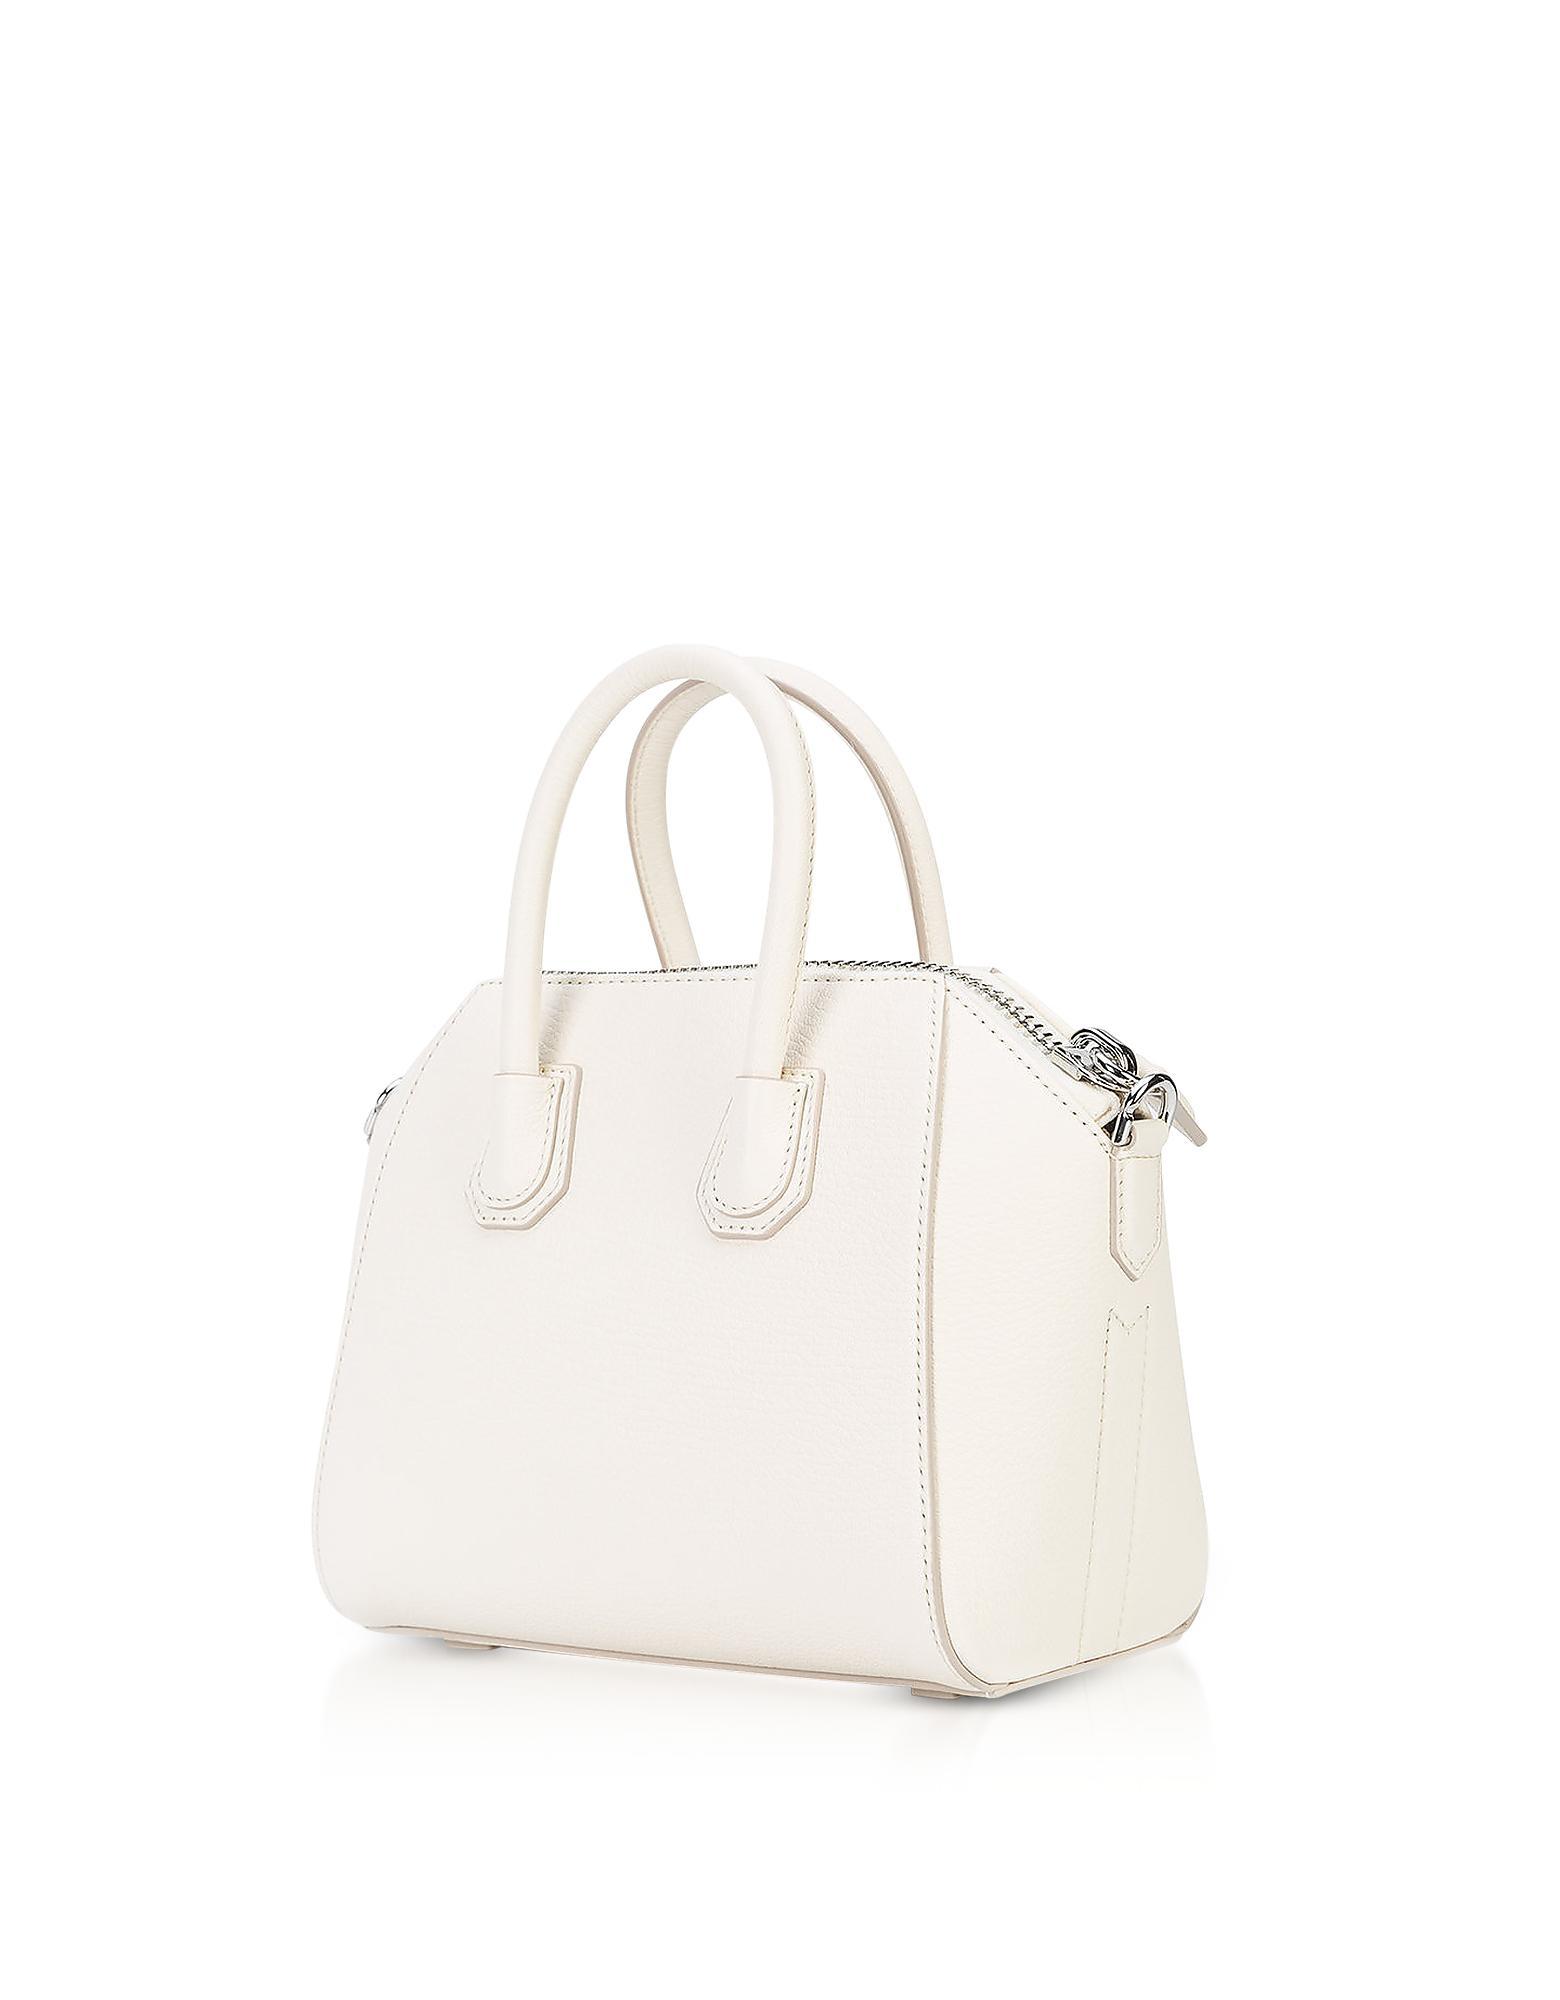 a7a8d7c0e29e Lyst - Givenchy Antigona Mini Off White Leather Satchel Bag in White